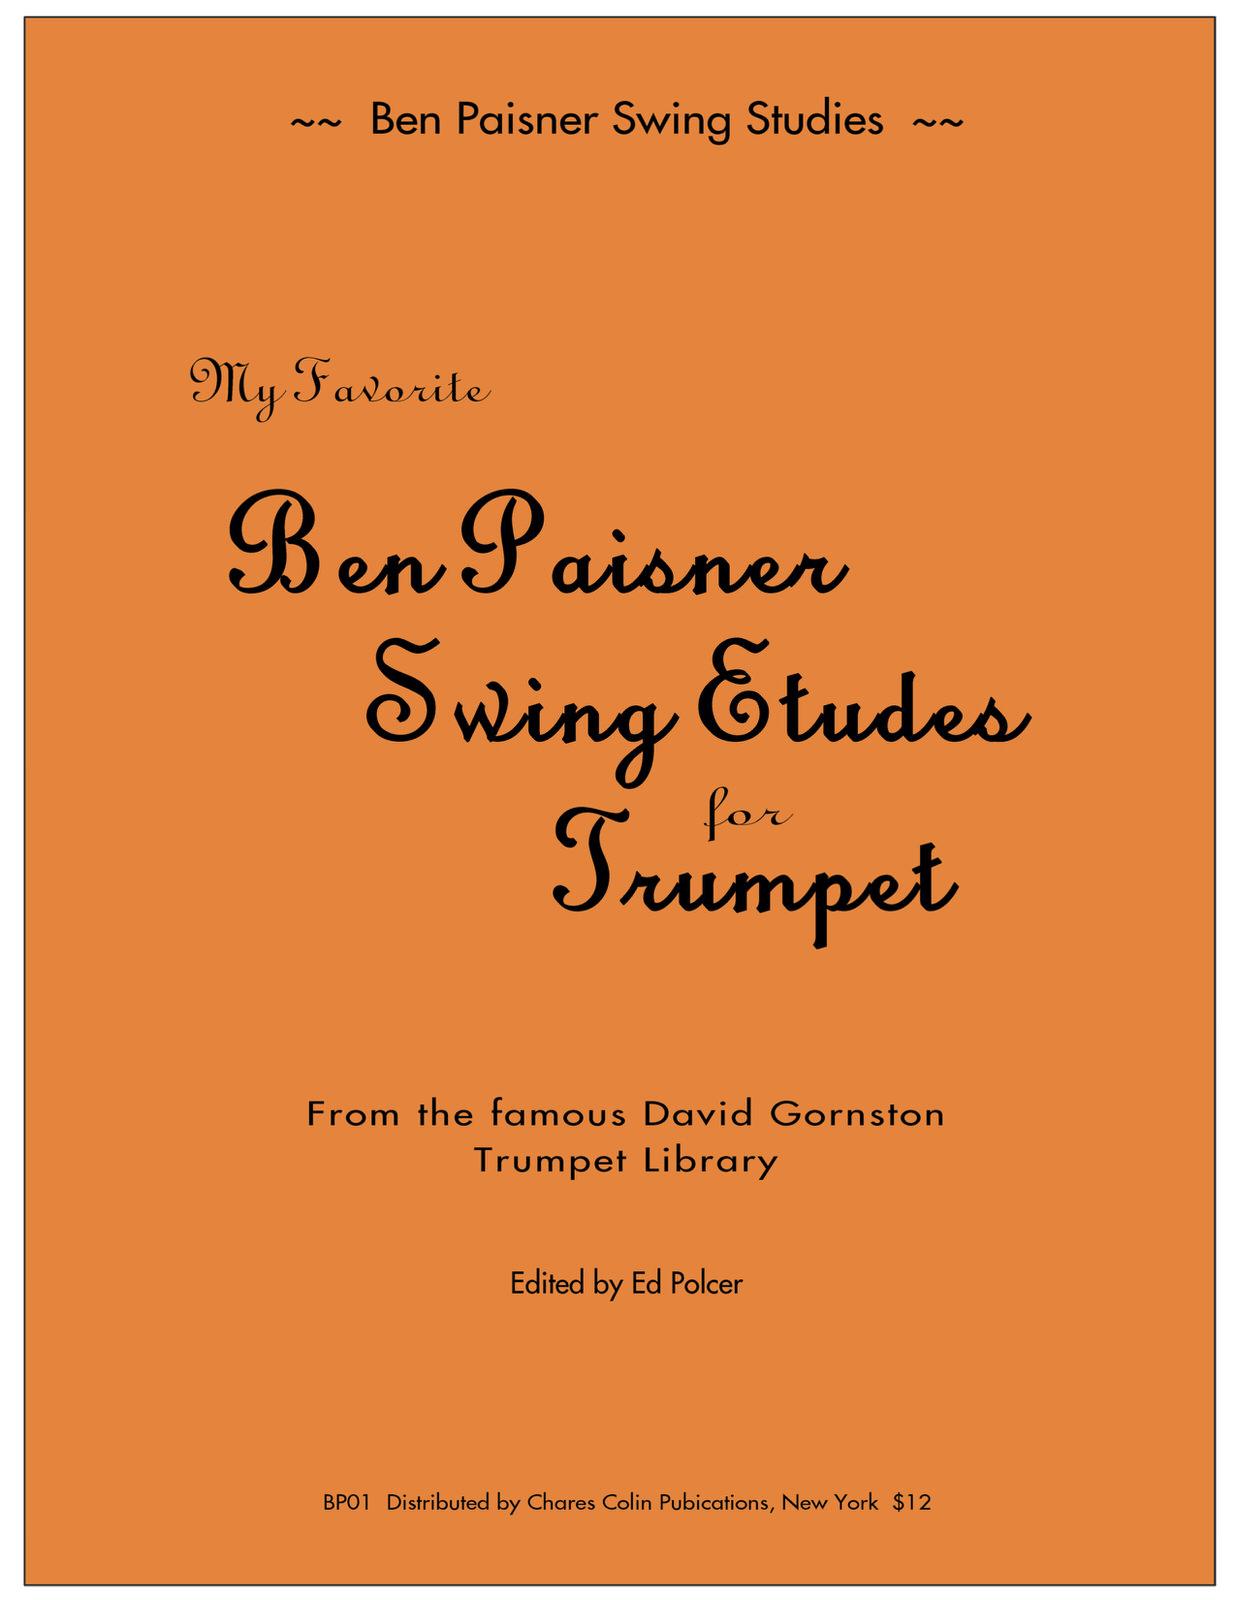 Swing Etudes for Trumpet